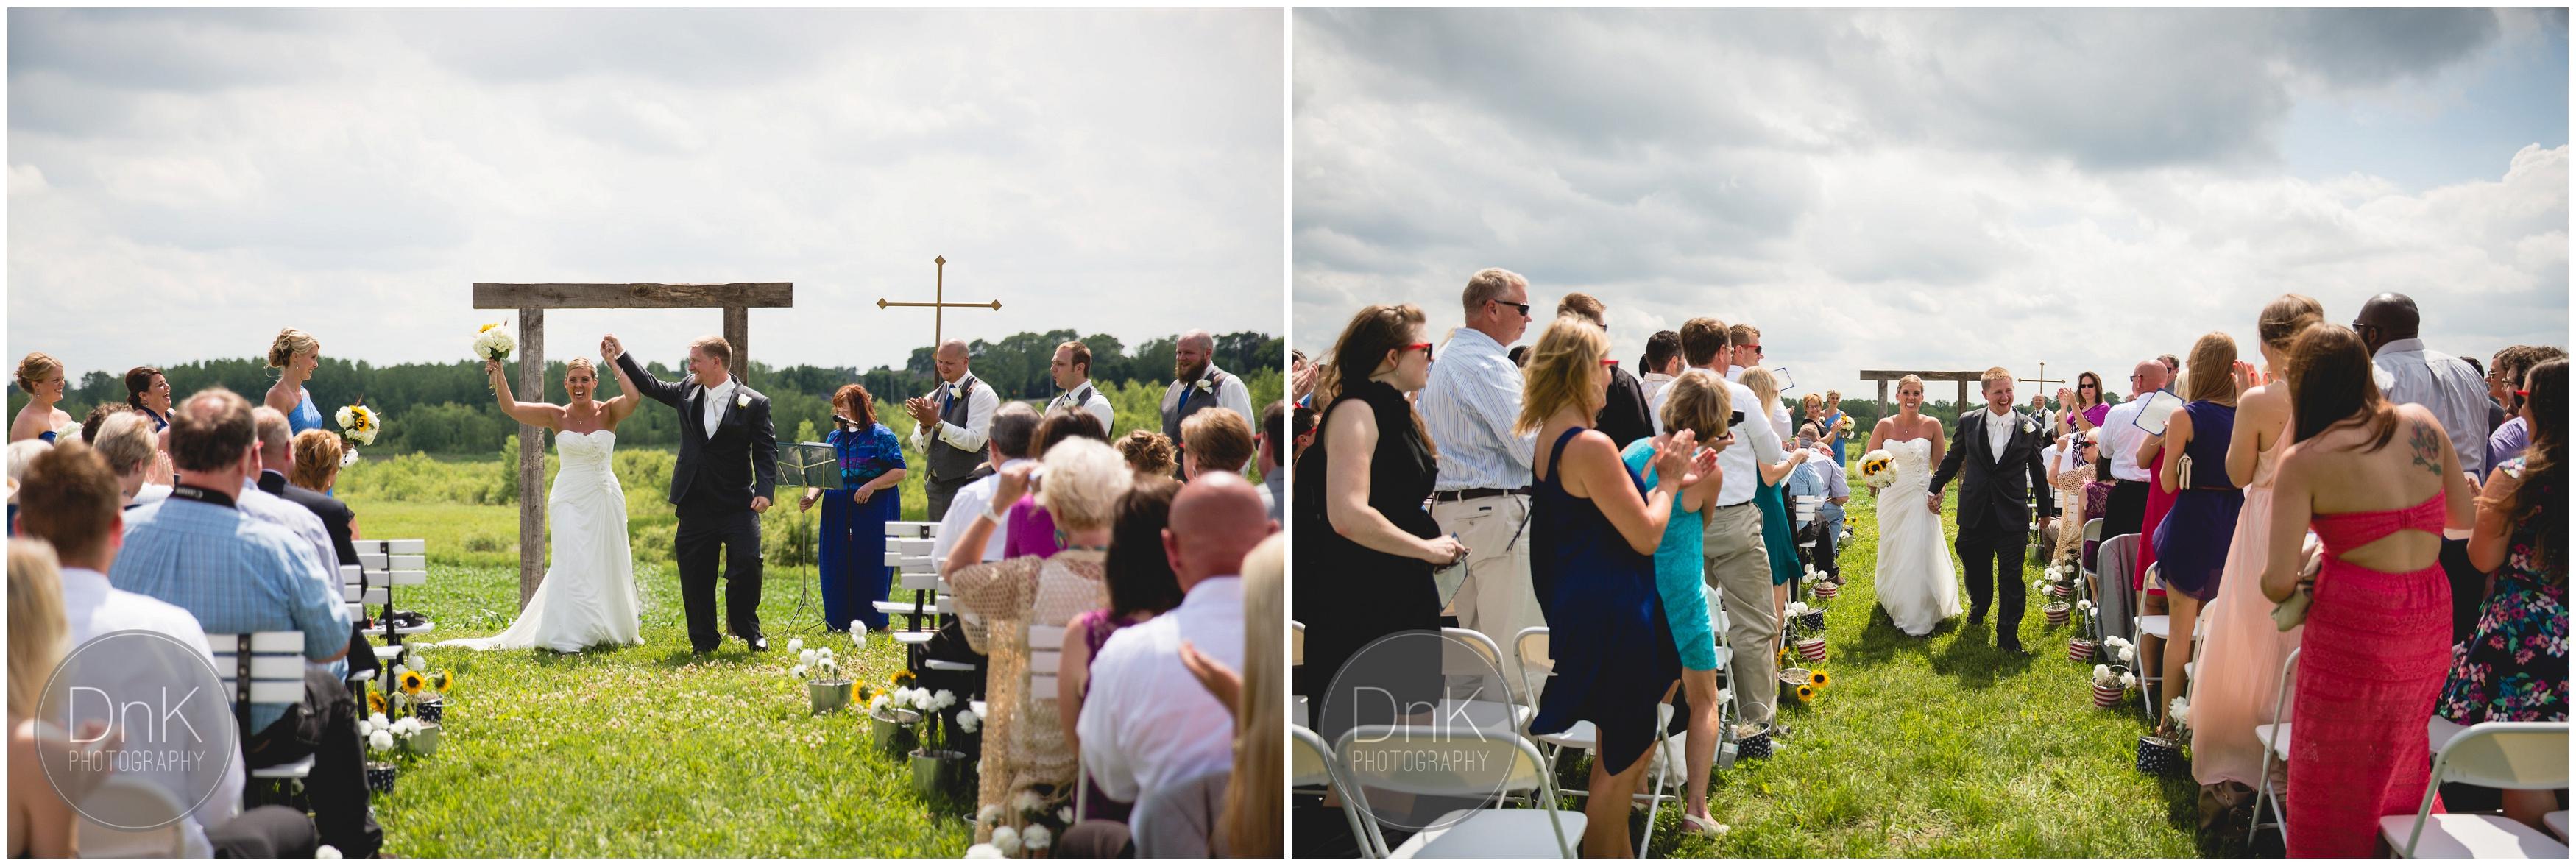 26- Outdoor Wedding Ceremony Dellwood Barn